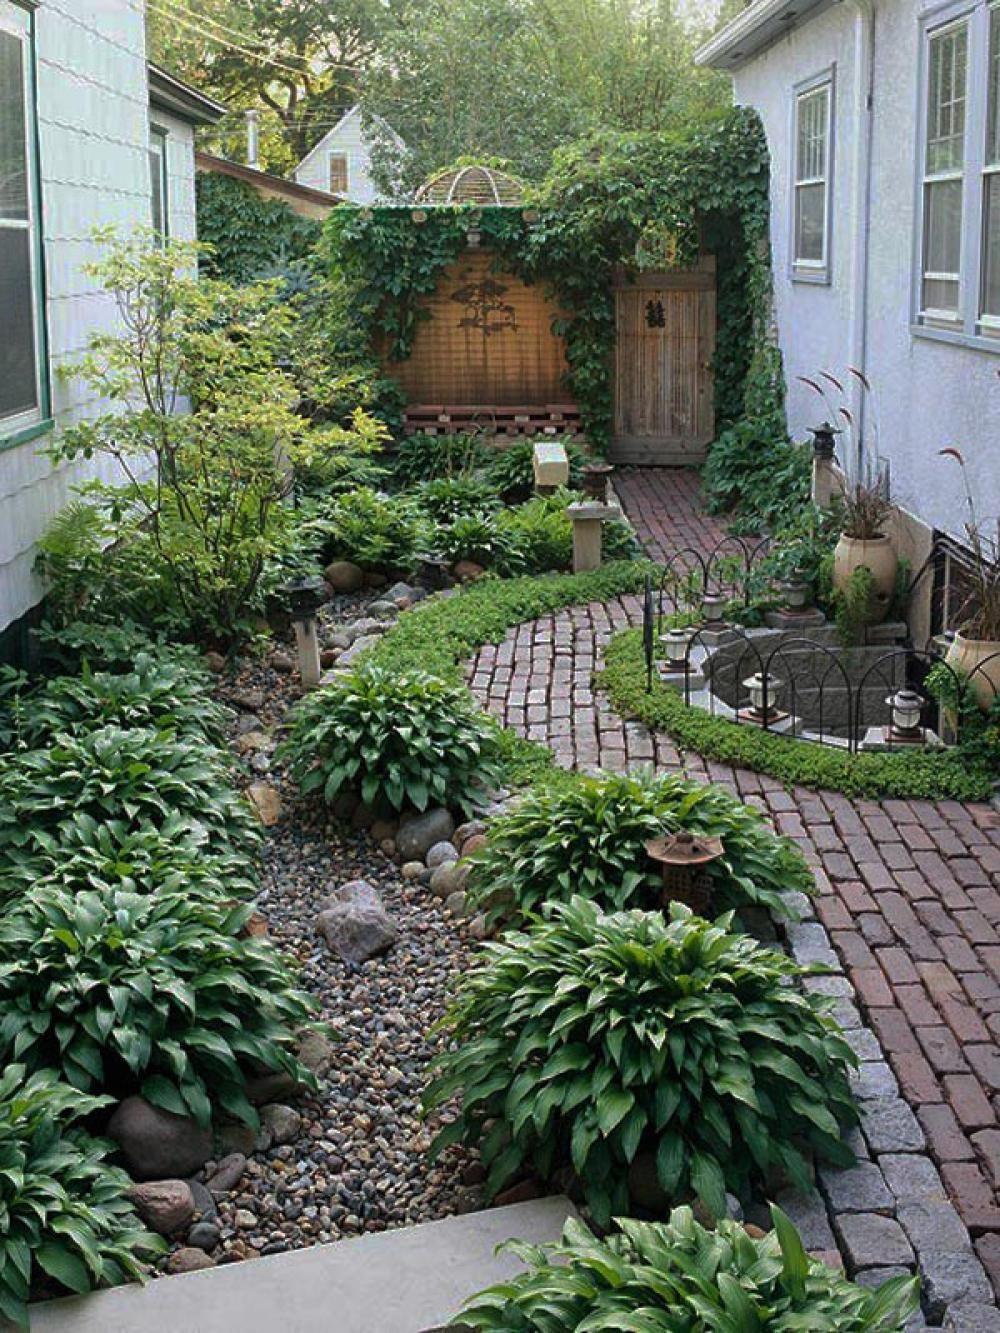 Privacy Design For Small Yards Garden Design Home Garden Design Ideas For Sma Front Yard Landscaping Design Small Garden Design Backyard Landscaping Designs